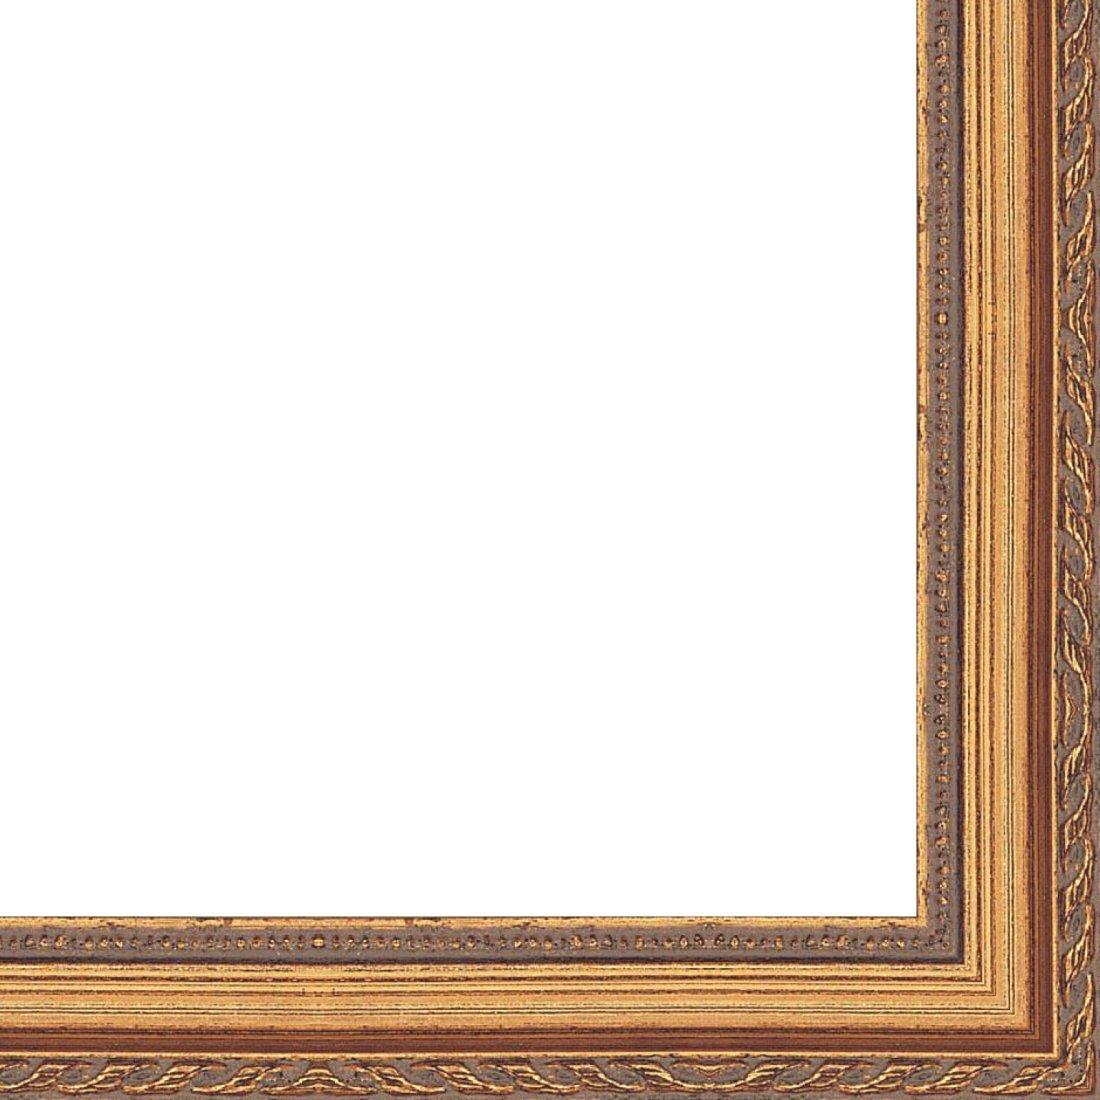 Picture Frame Moulding (Wood) 18ft bundle - Traditional Antique Gold Finish - 0.75'' width - 3/8'' rabbet depth